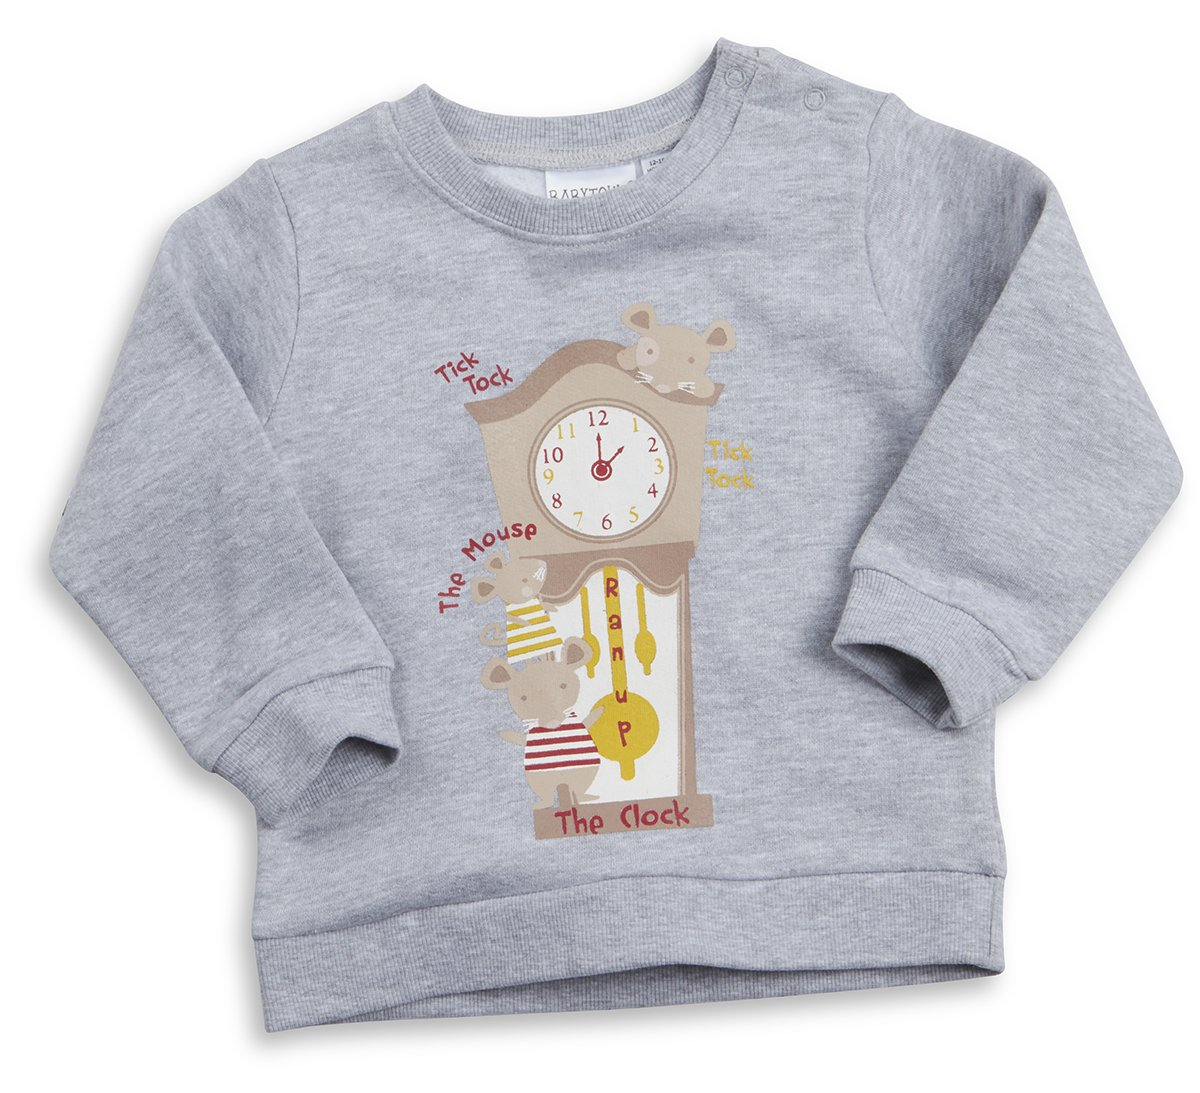 Babytown Baby Boy Girl New Long Sleeve Sweatshirt Jumper Nursery Rhymes Toddler